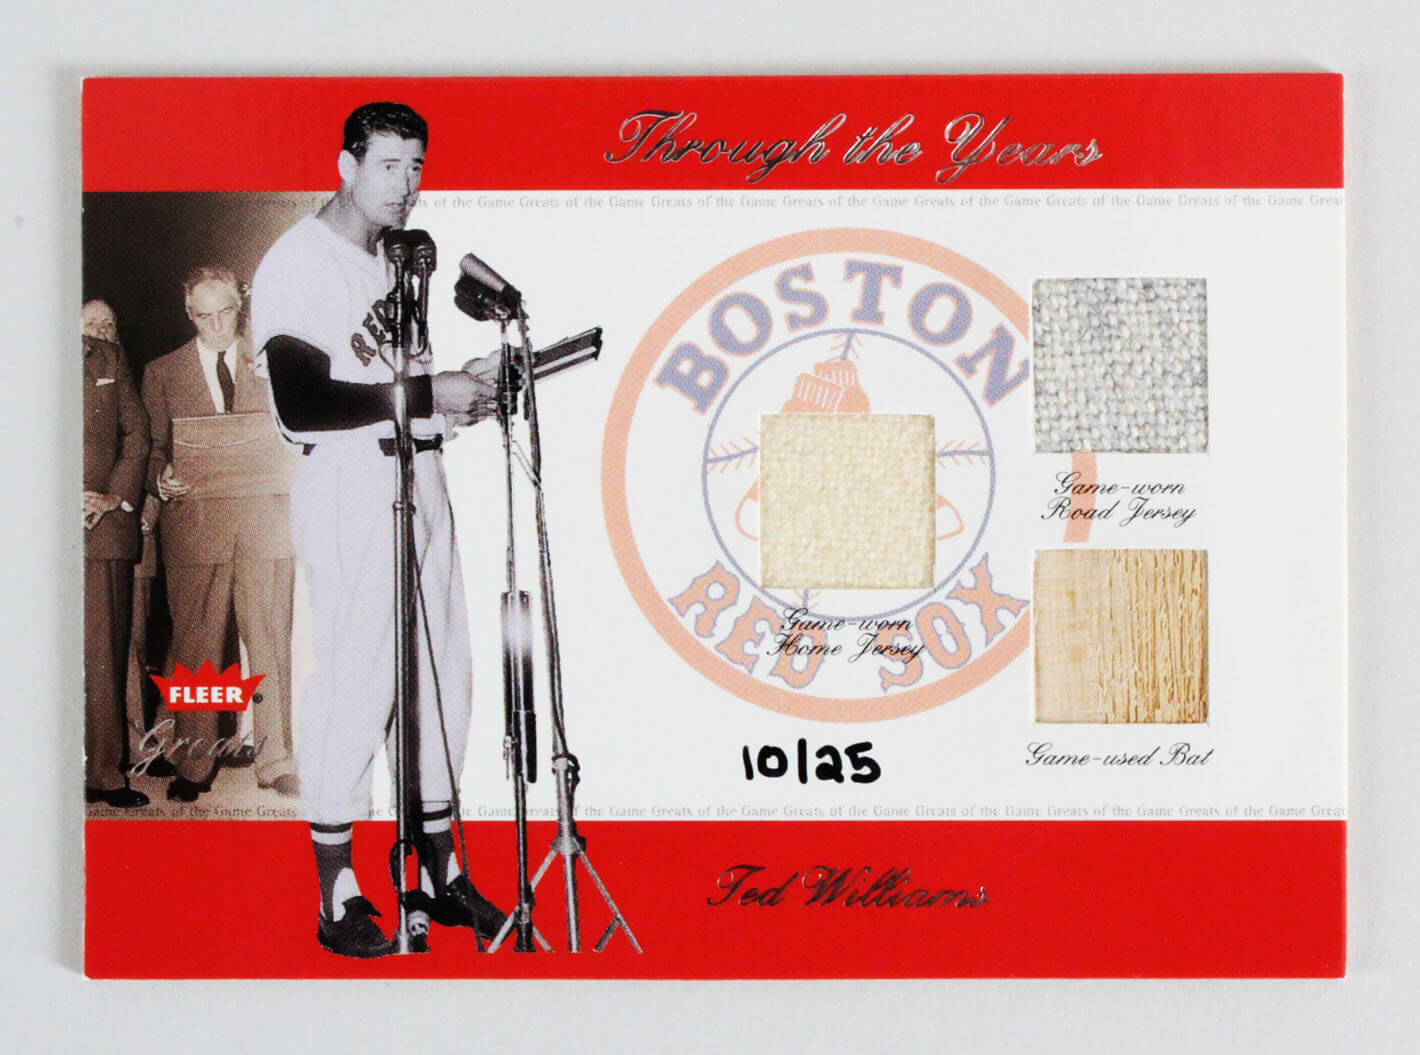 2002 Fleer Greats Ted Williams GU Jersey & Baseball Bat Card Through the Years Boston Red Sox 10/25